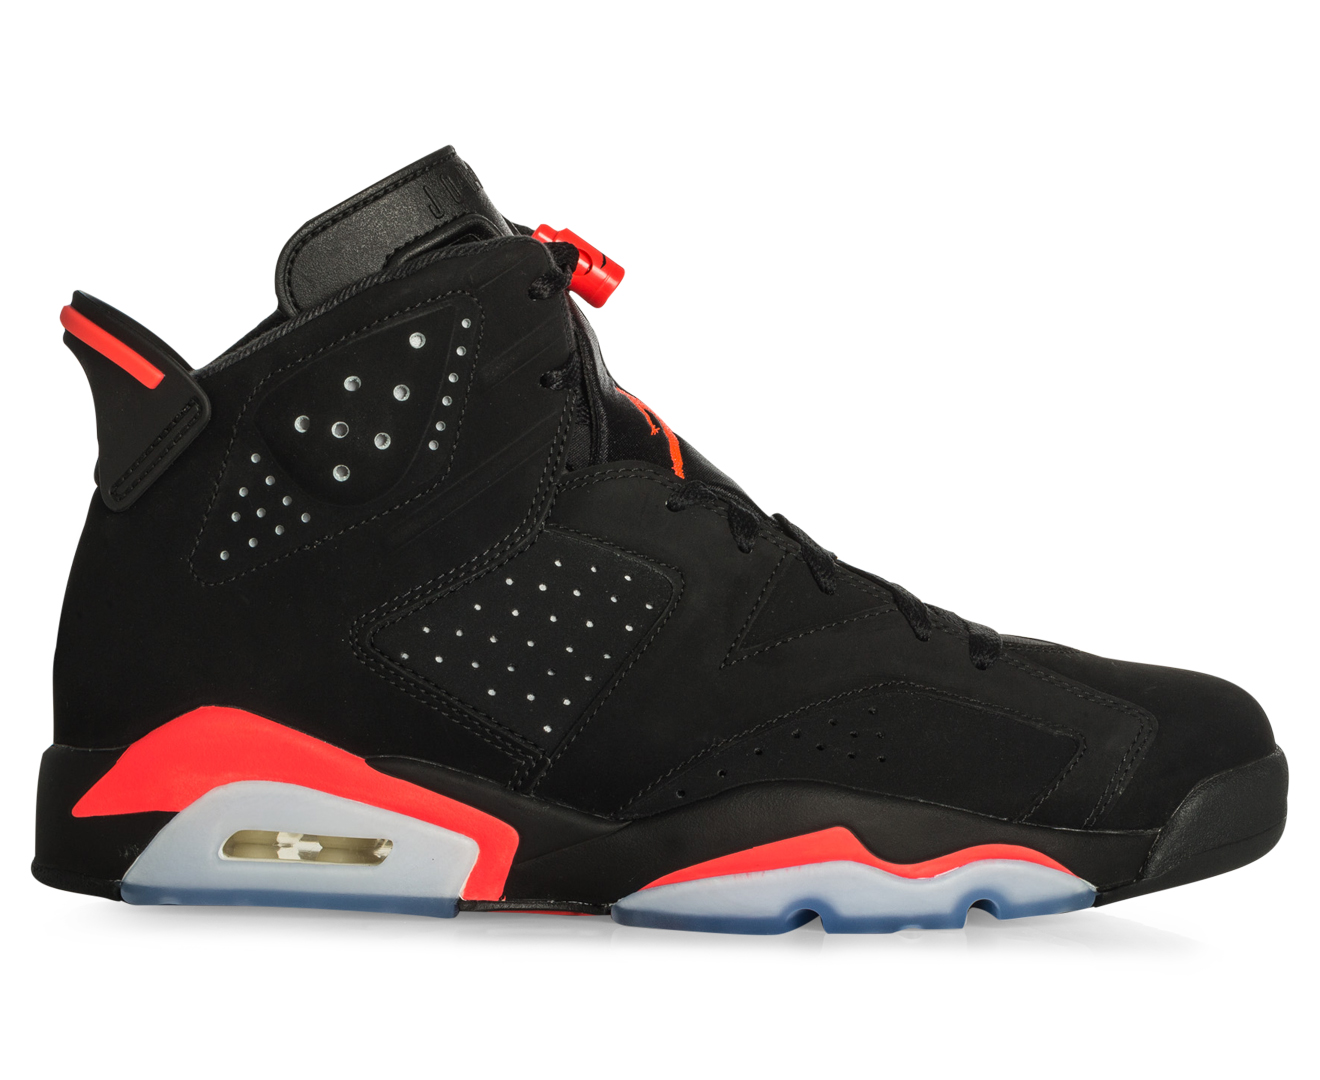 Nike Air Jordan 6 Vi Rétro - Noir / Infrarouge Massagers Profondes